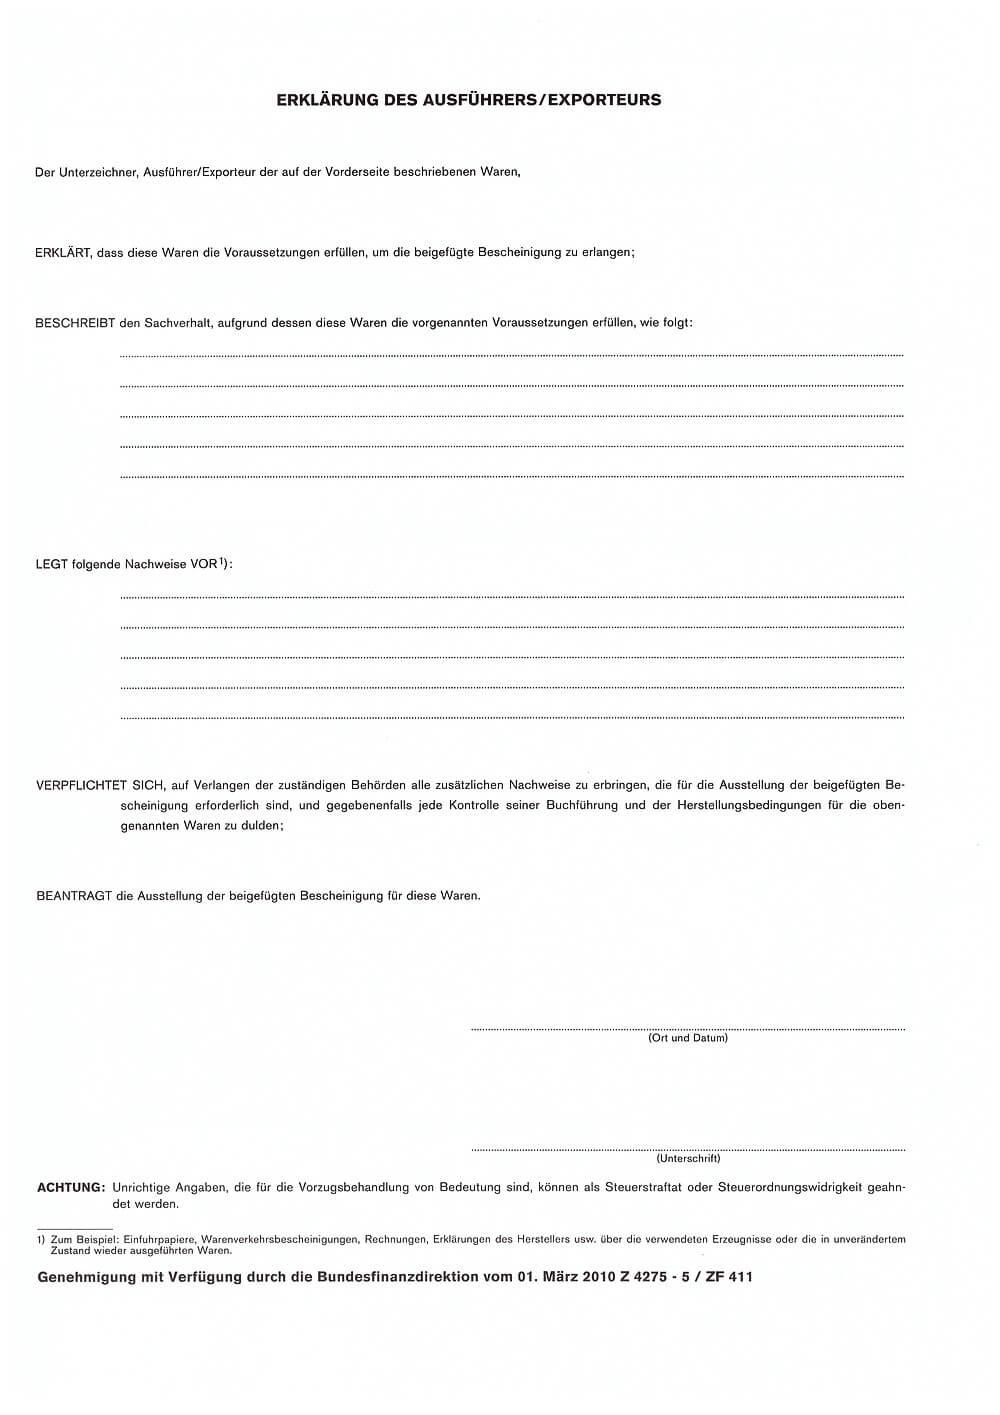 Warenverkehrsbescheinigung-EUR-1-Rueckseite-Forum-Verlag-Herkert-GmbH